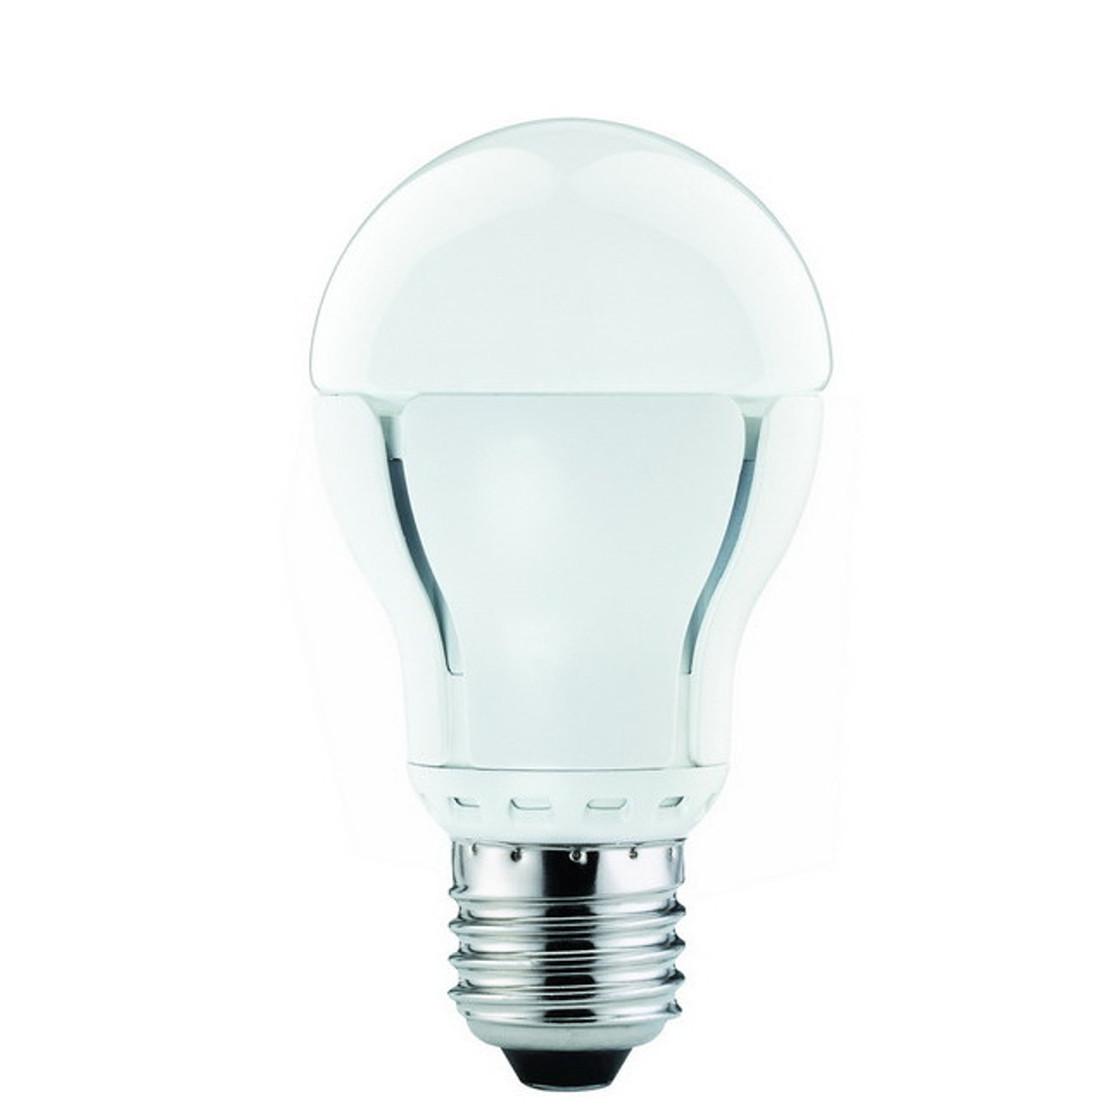 paulmann led agl leuchtmittel 6 5 w e27 warmweiss lampen ram 6 99. Black Bedroom Furniture Sets. Home Design Ideas